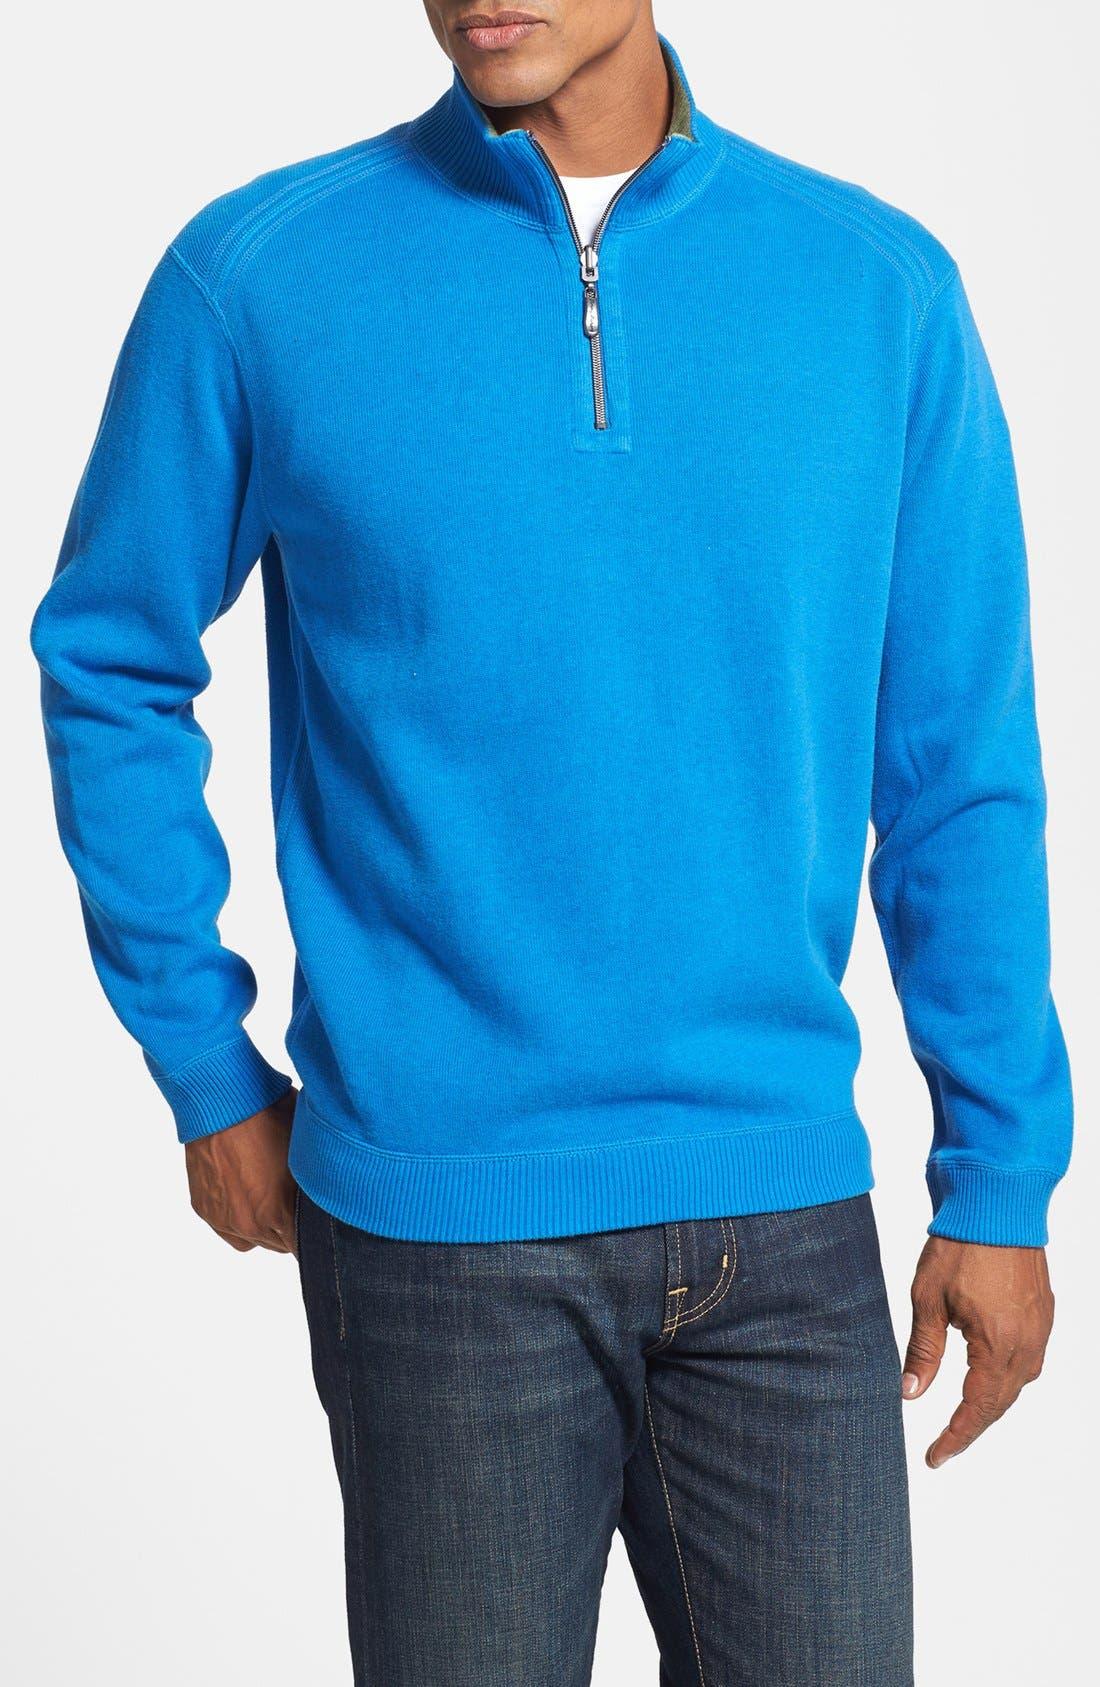 Main Image - Tommy Bahama 'Flip Side Pro' Reversible Half Zip Pullover